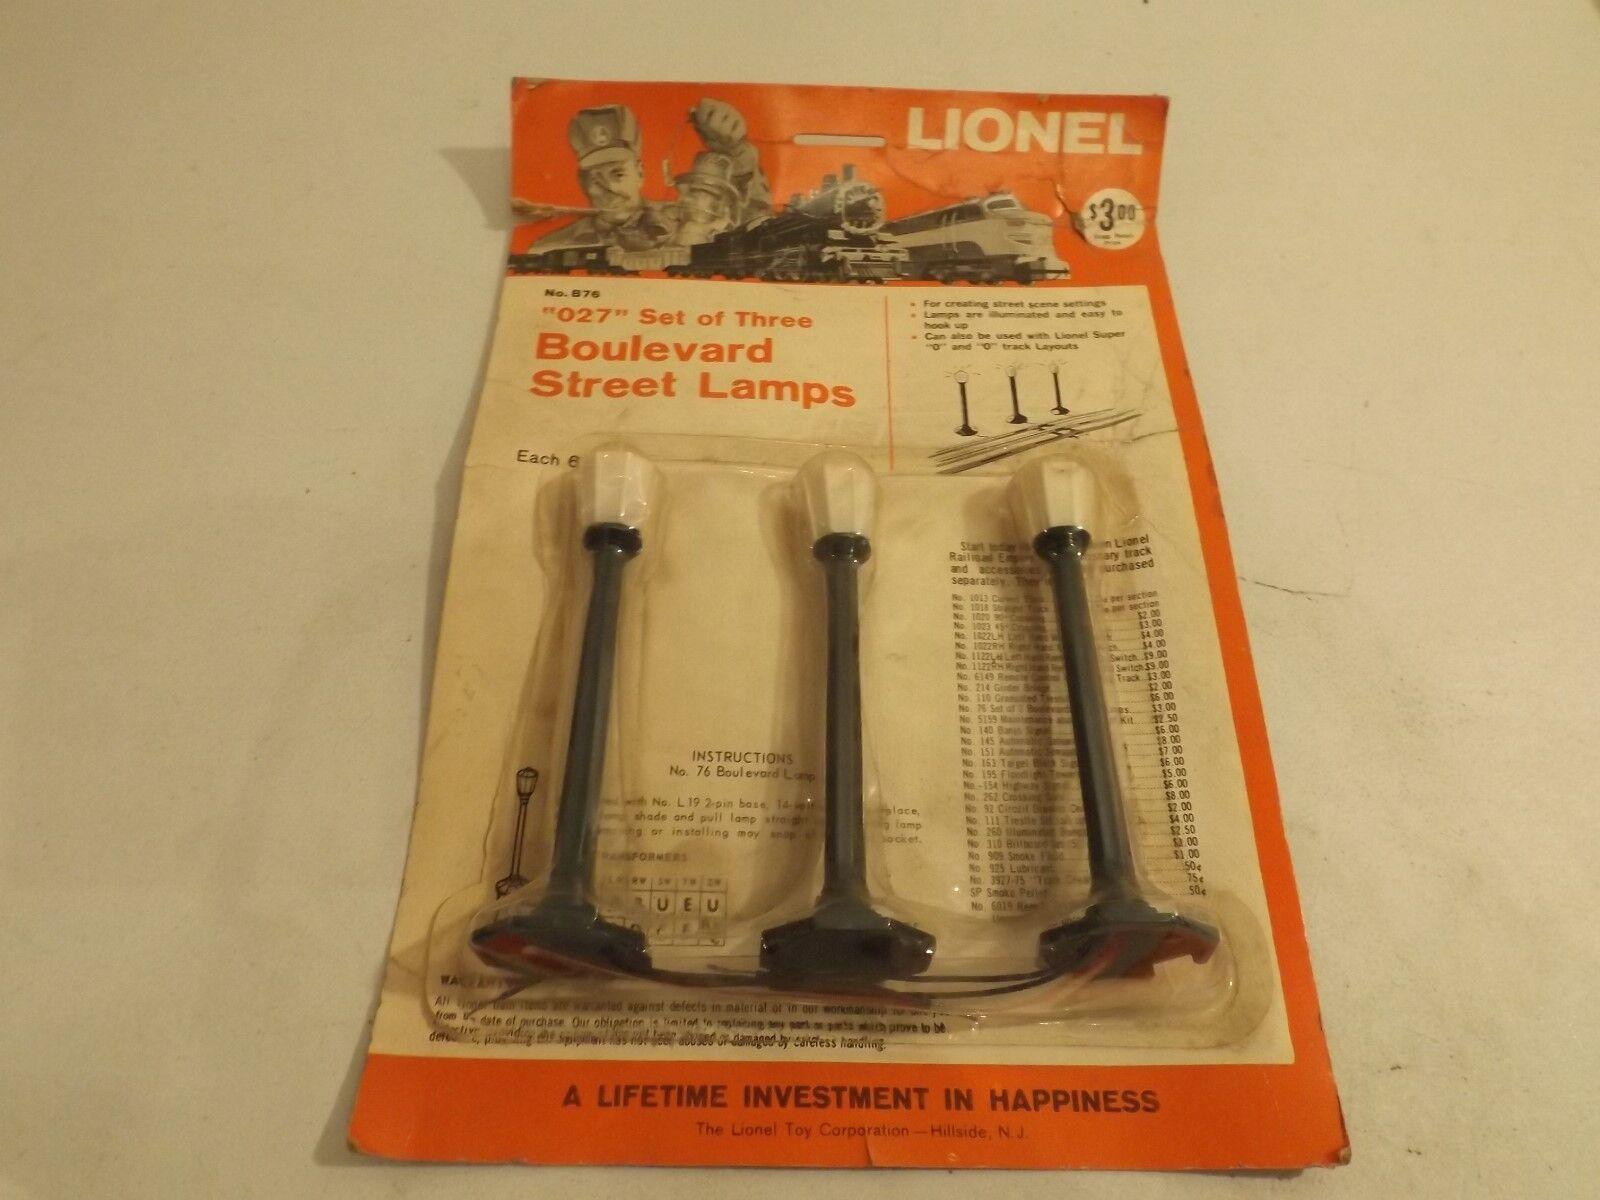 O Lionel B76 Boulevard street lamps set in orig pkg - ships free to lower 48 U.S